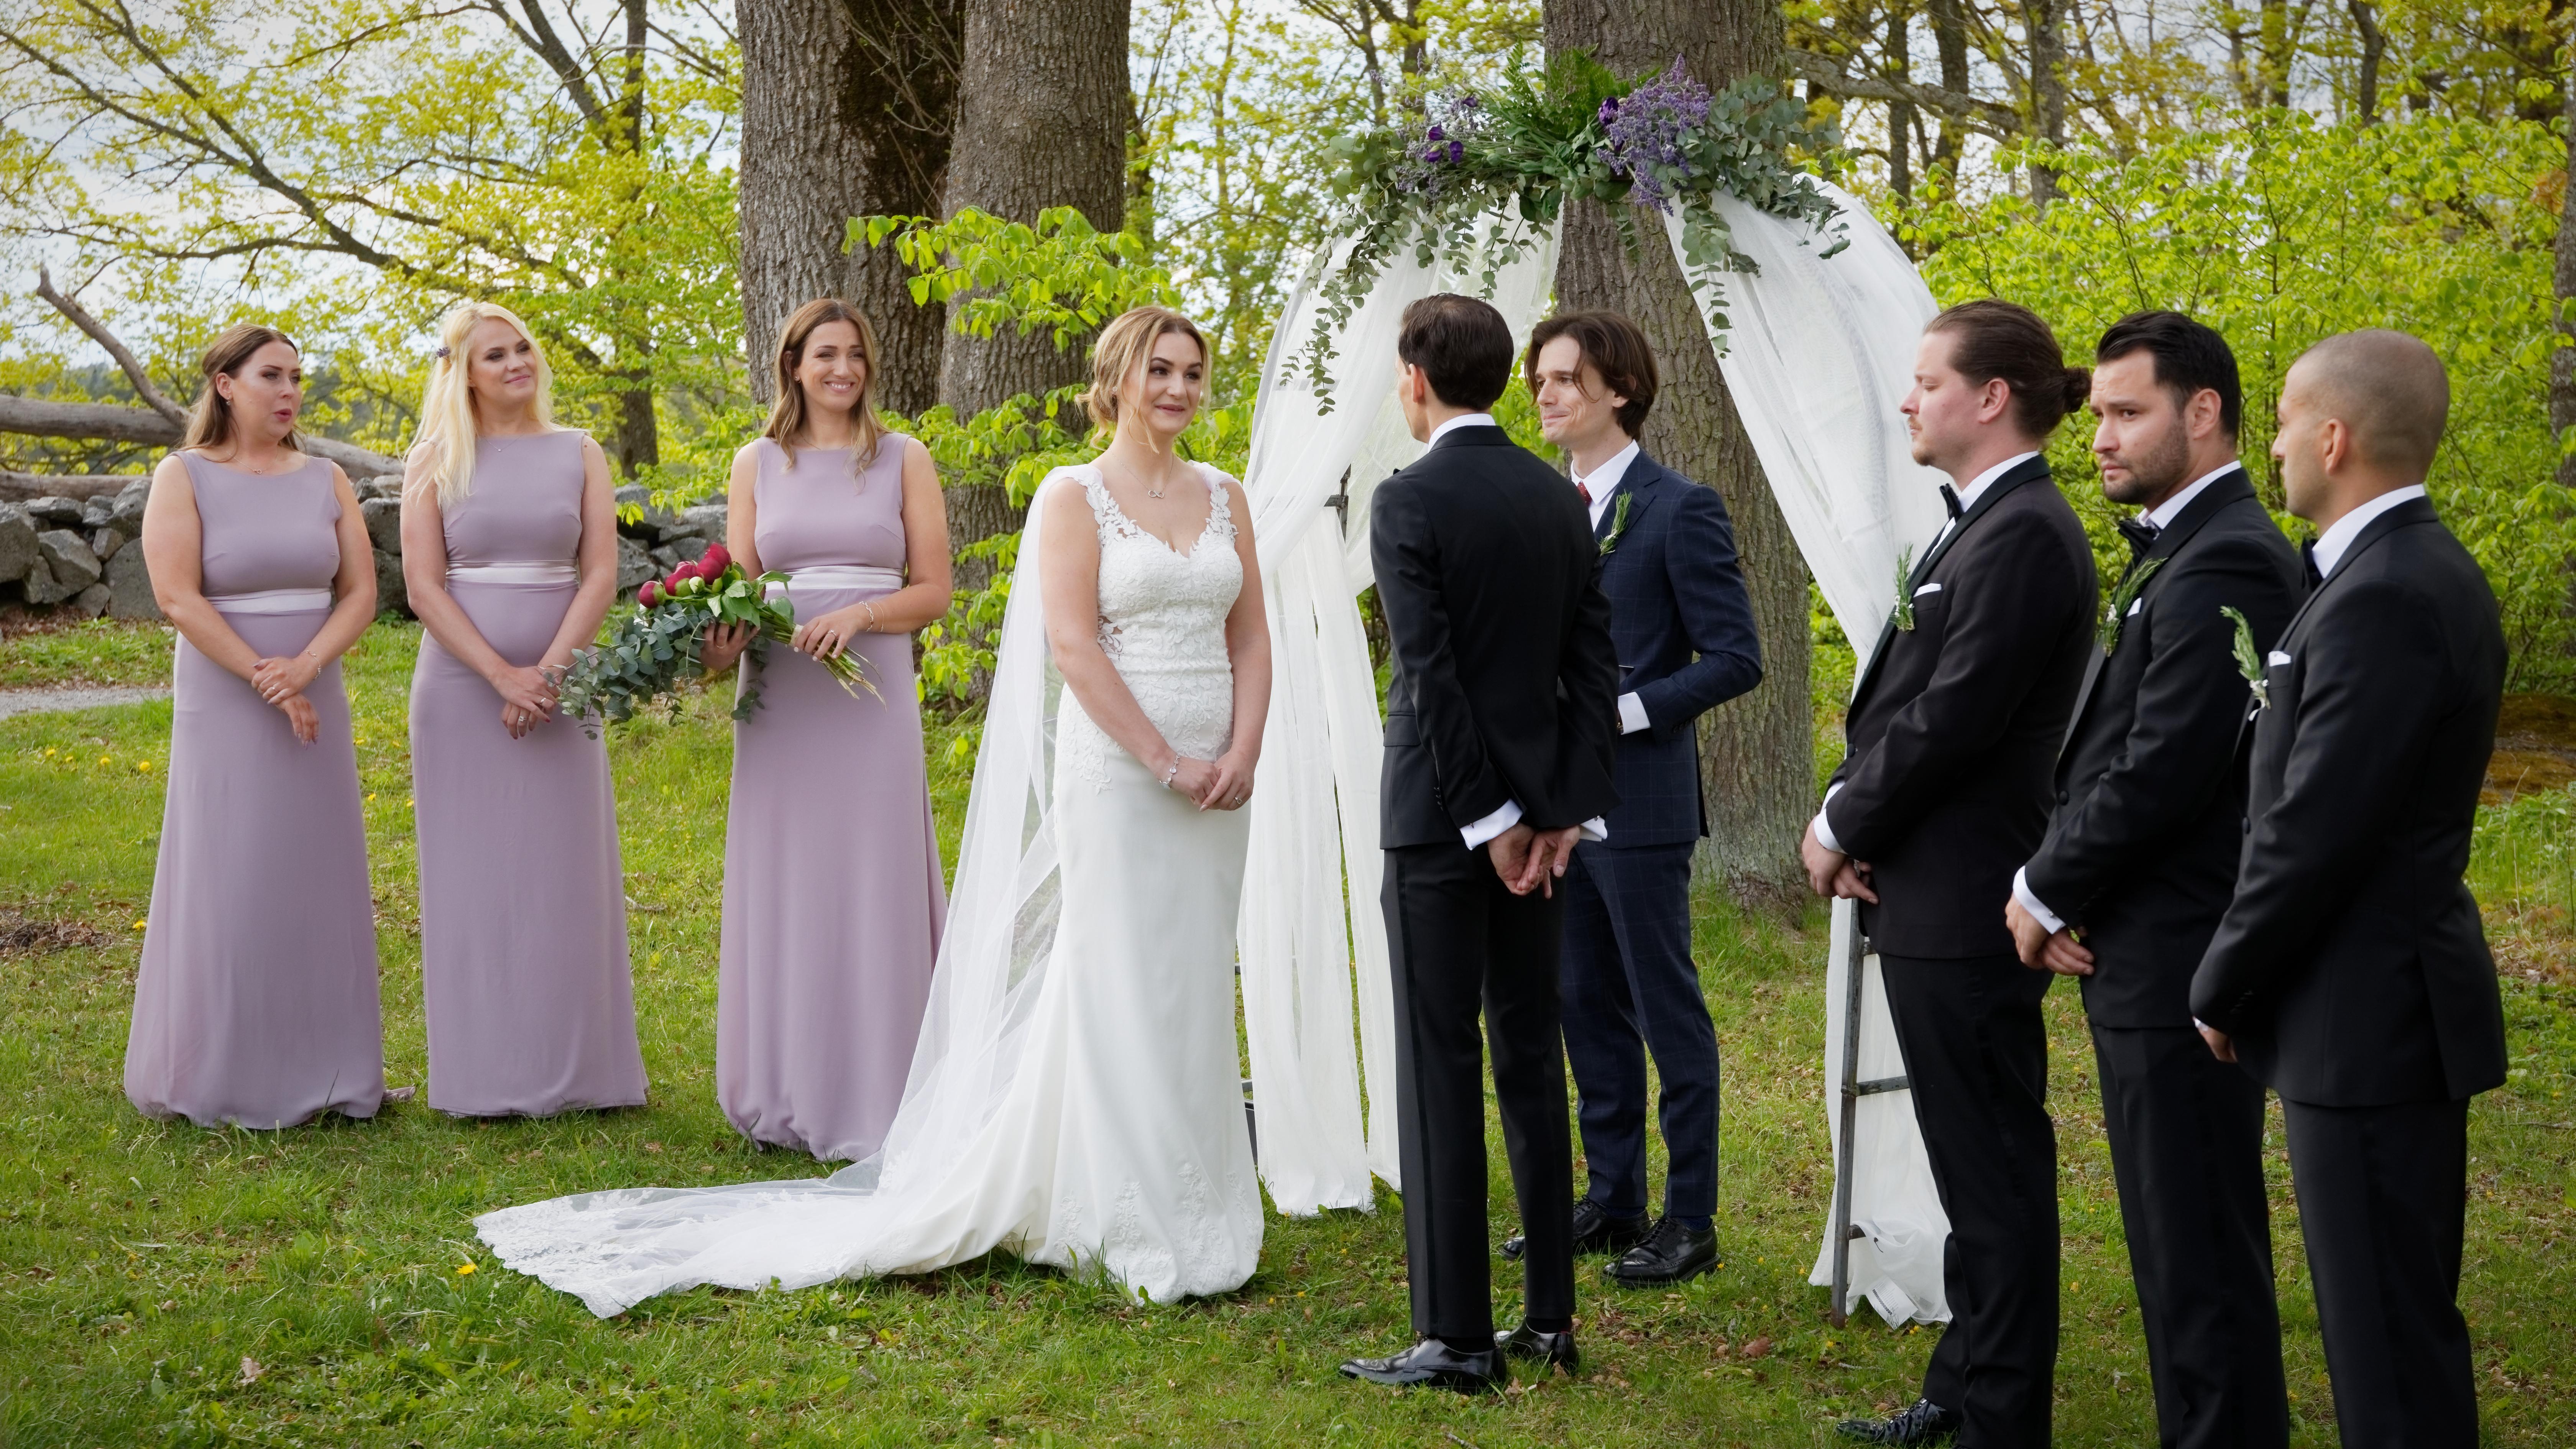 Brudpar & följe, bröllopsceremoni 2